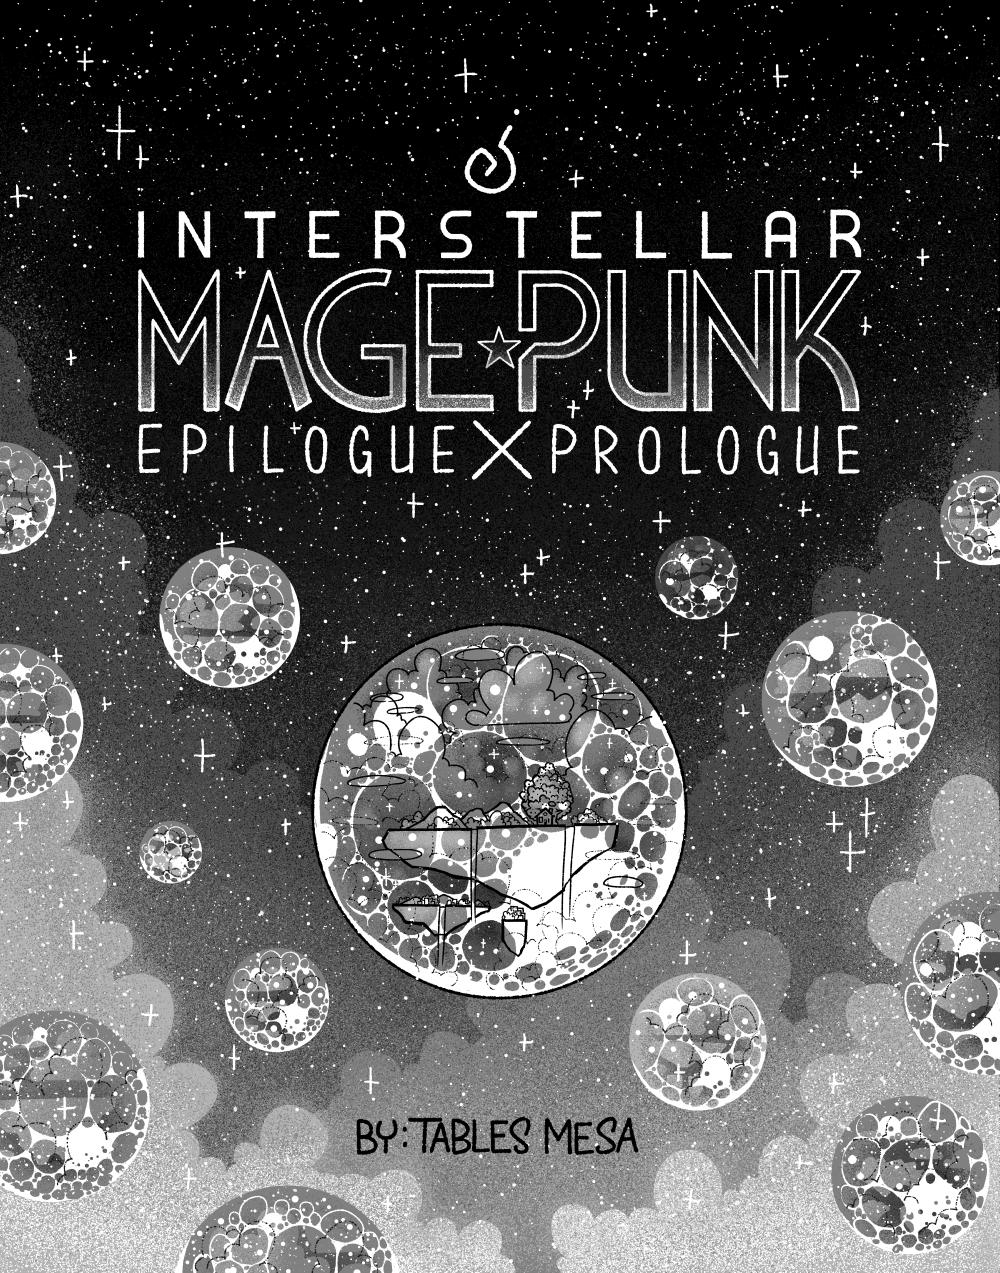 Interstellar Mage Punk: Epilogue X Prologue – Cover